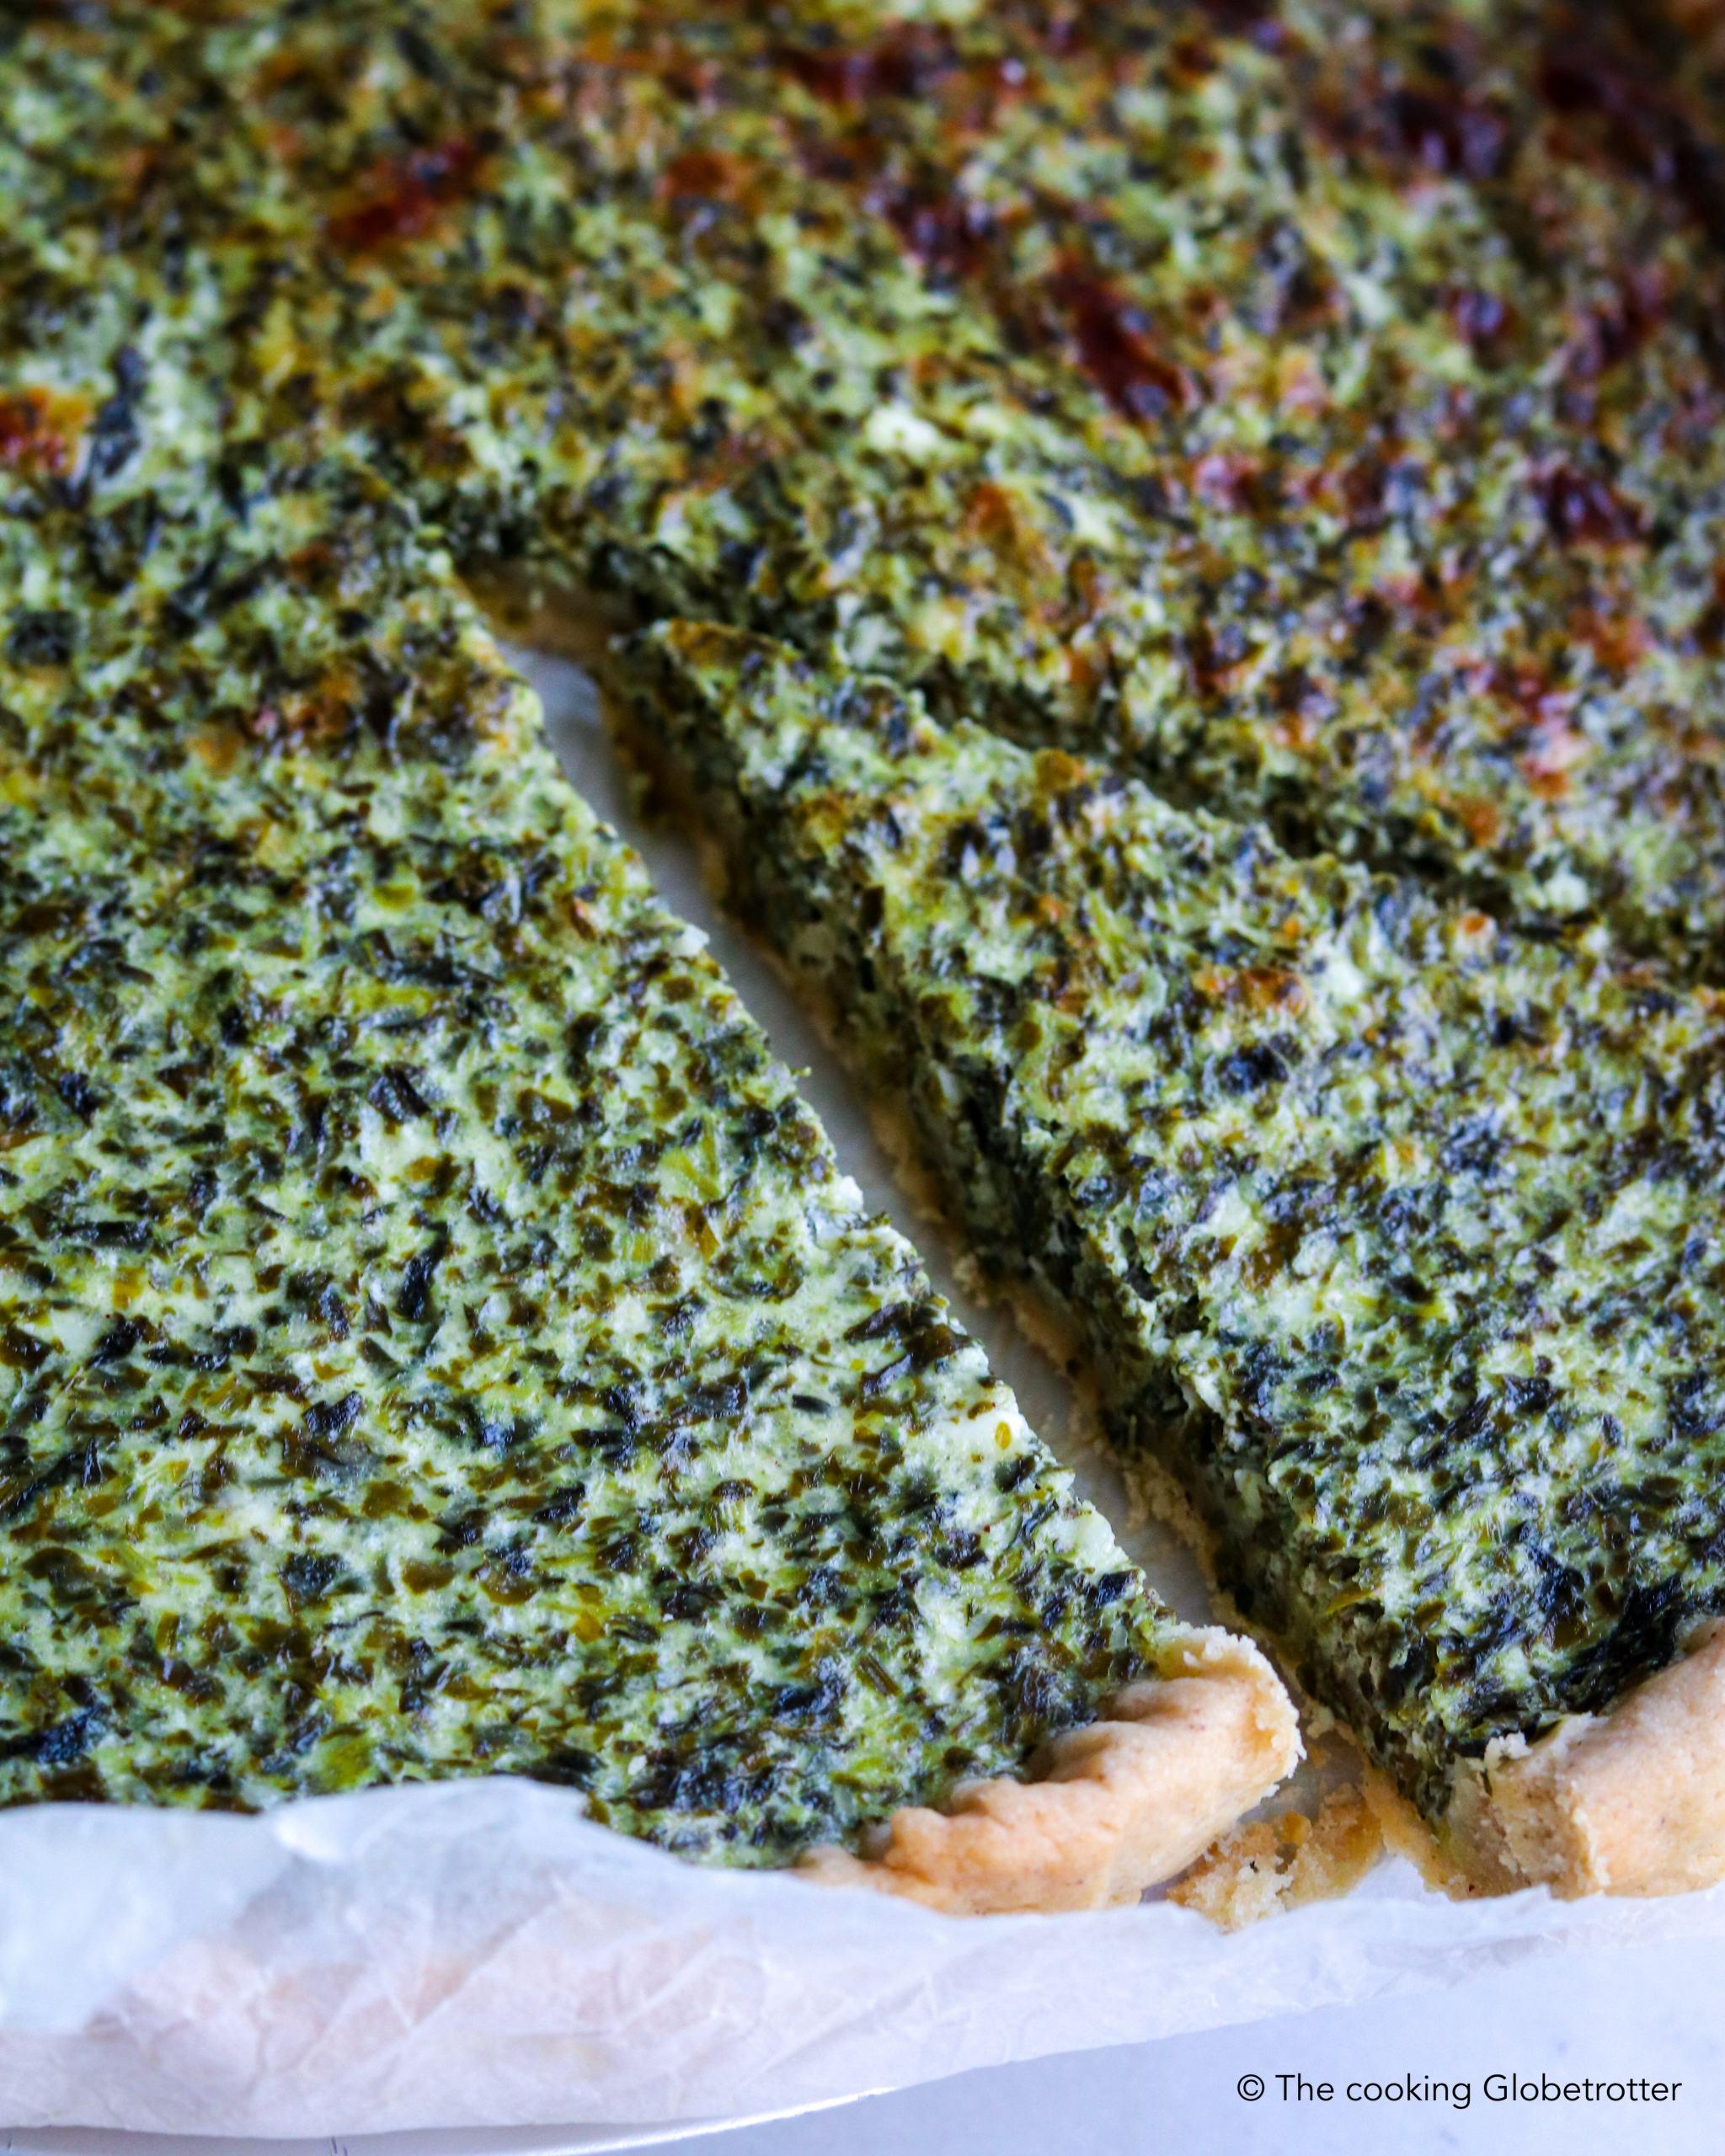 Recipe for homemade quiche spinach ricotta healthy easy pie